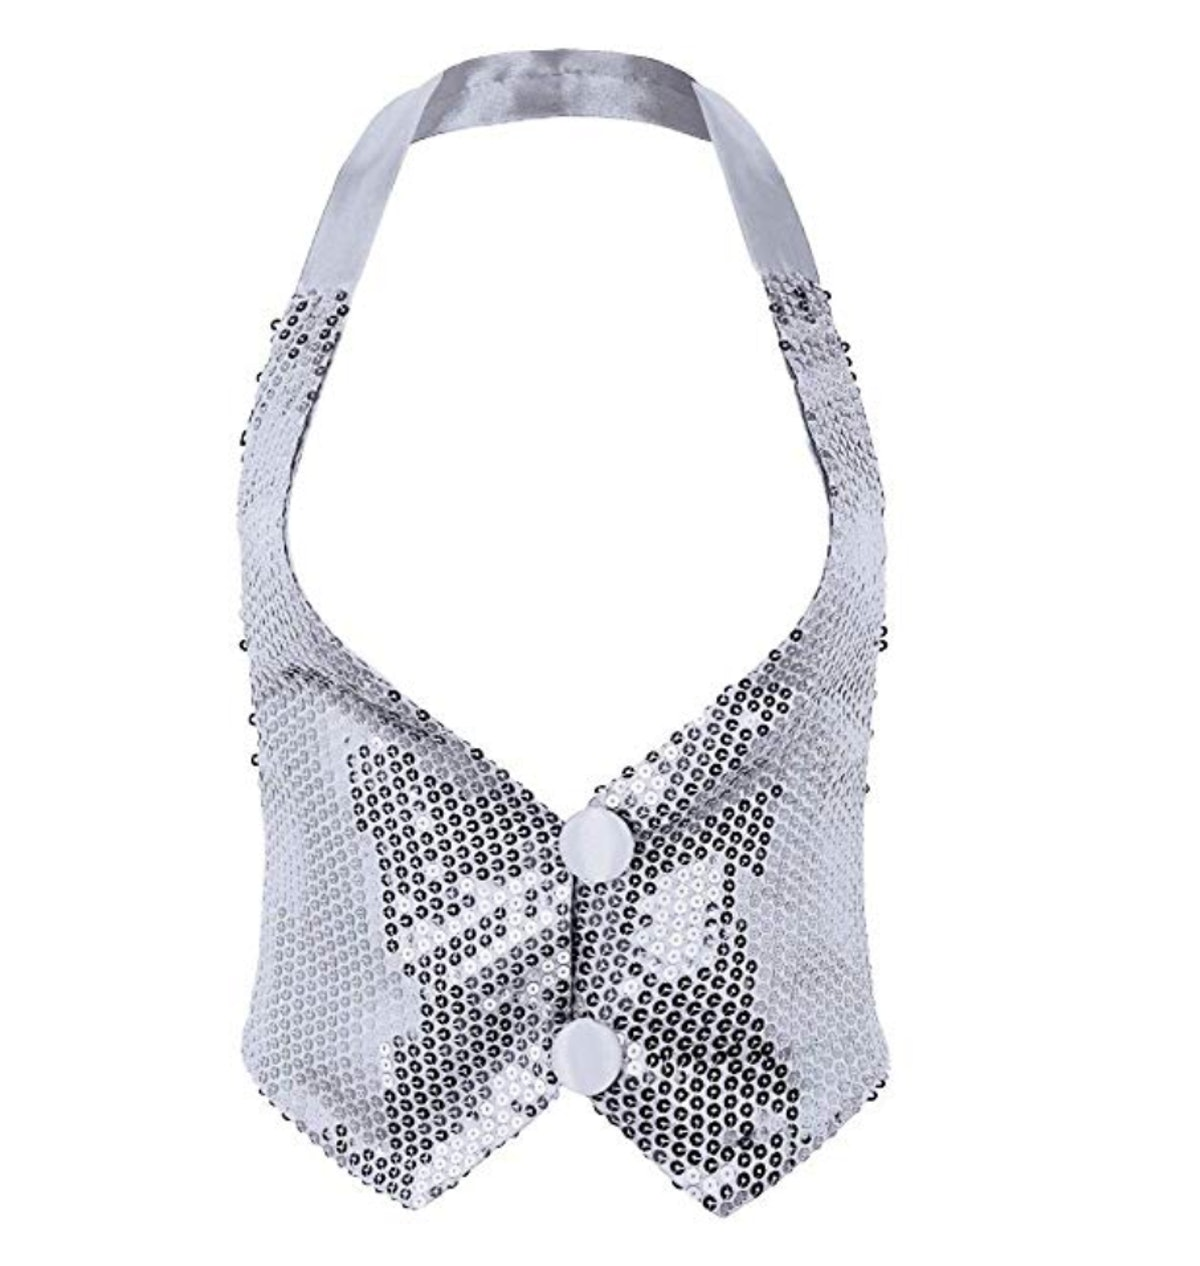 ACSUSS Women's Glitter Sequins Vest Sleeveless Halter Neck Shirts Tank Tops